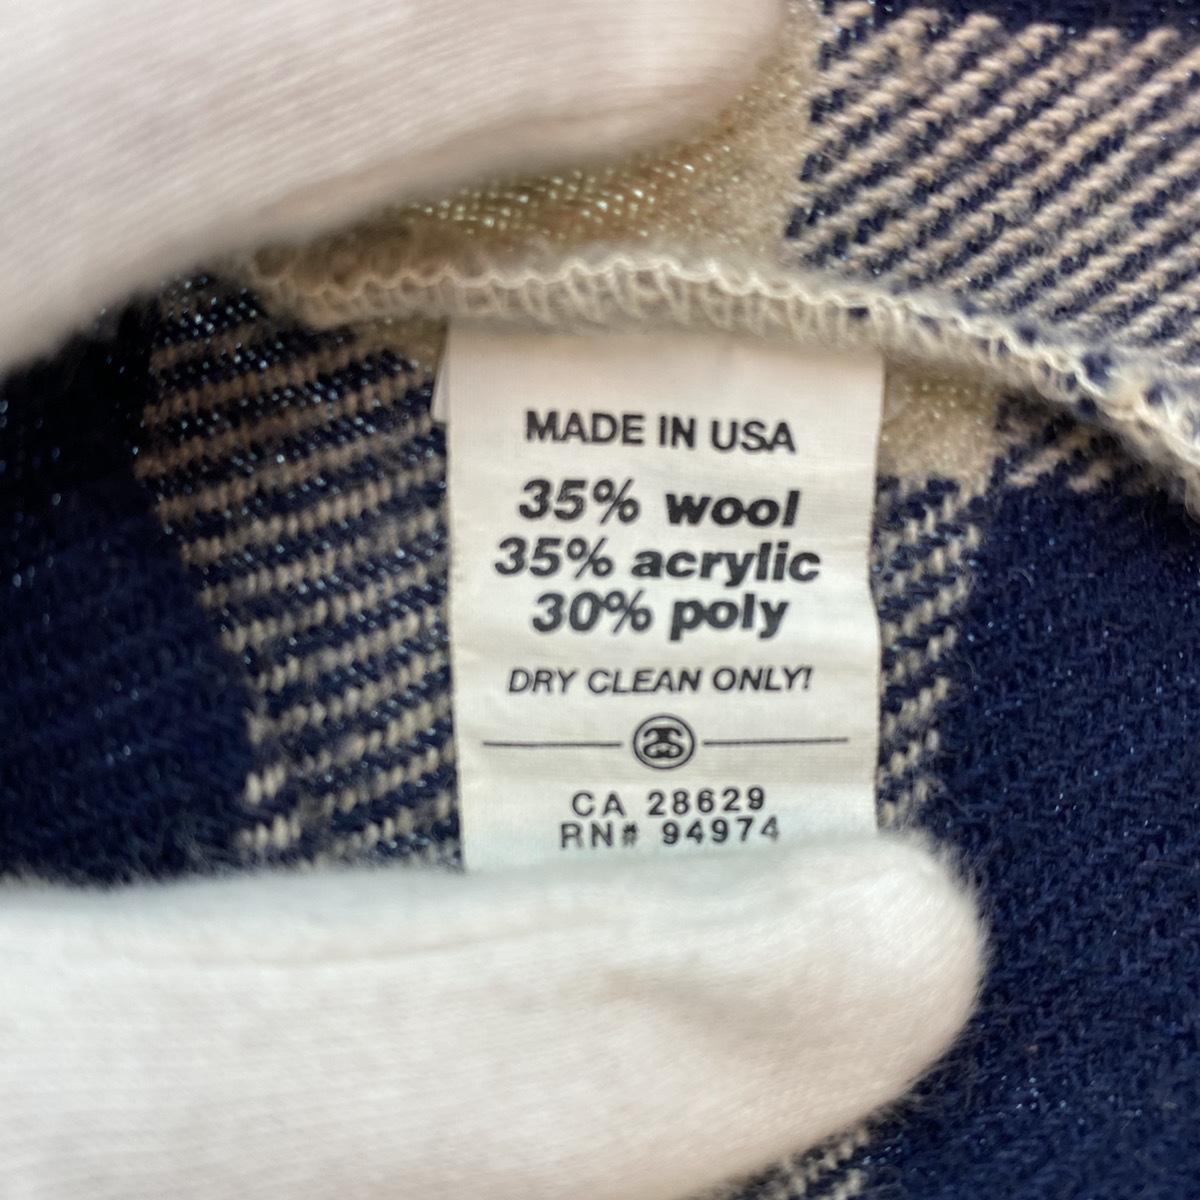 ●Stussy ステューシー OLD Stussy オールドステューシー 90s 90年代 紺タグ チェック ウール シャツ USA製 MADE IN USA 104_画像5